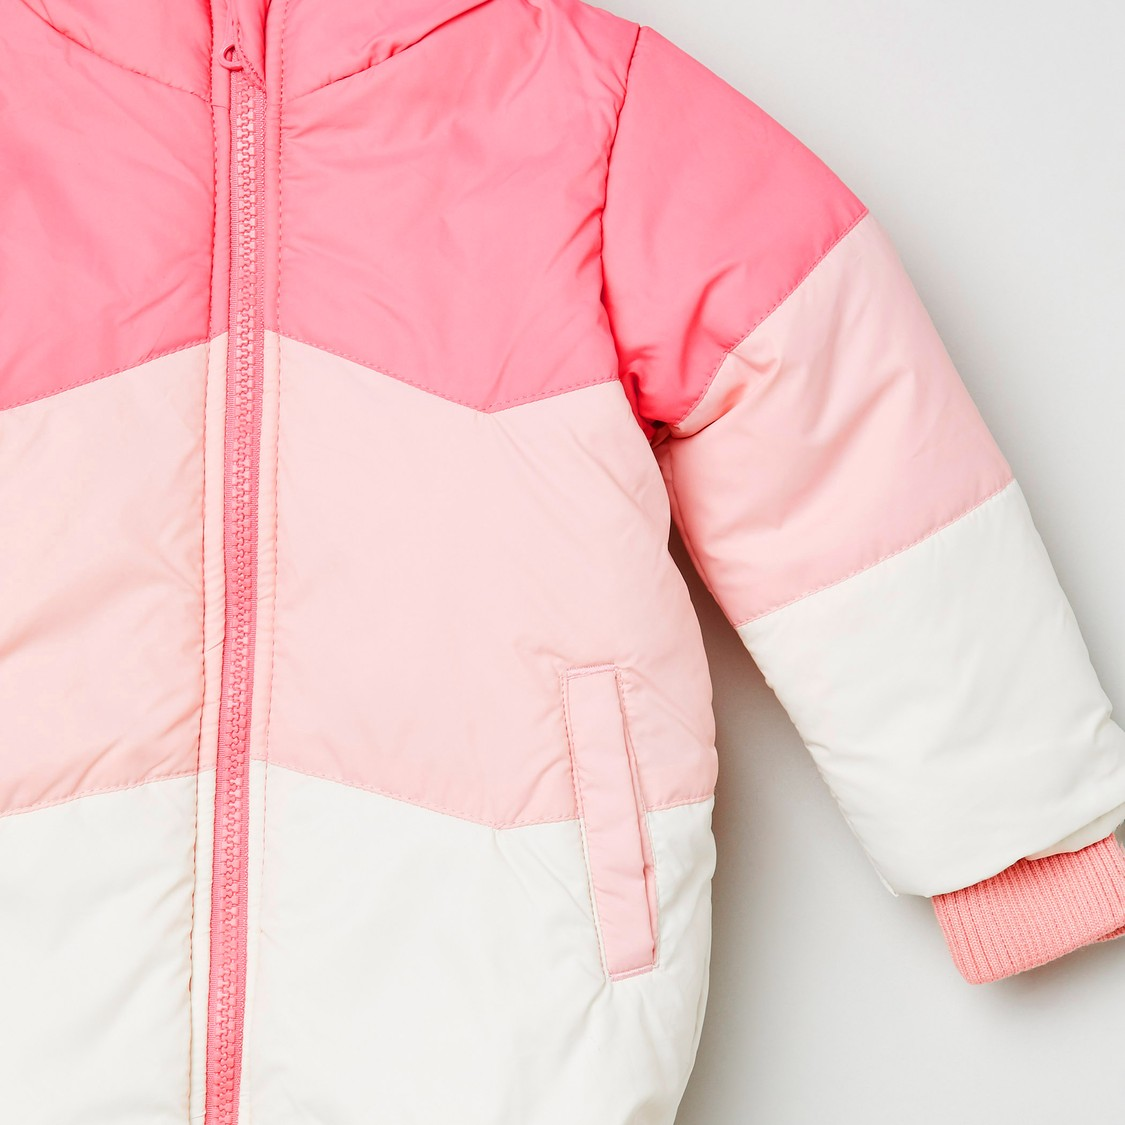 MAX Colourblocked Puffed Jacket with Hood